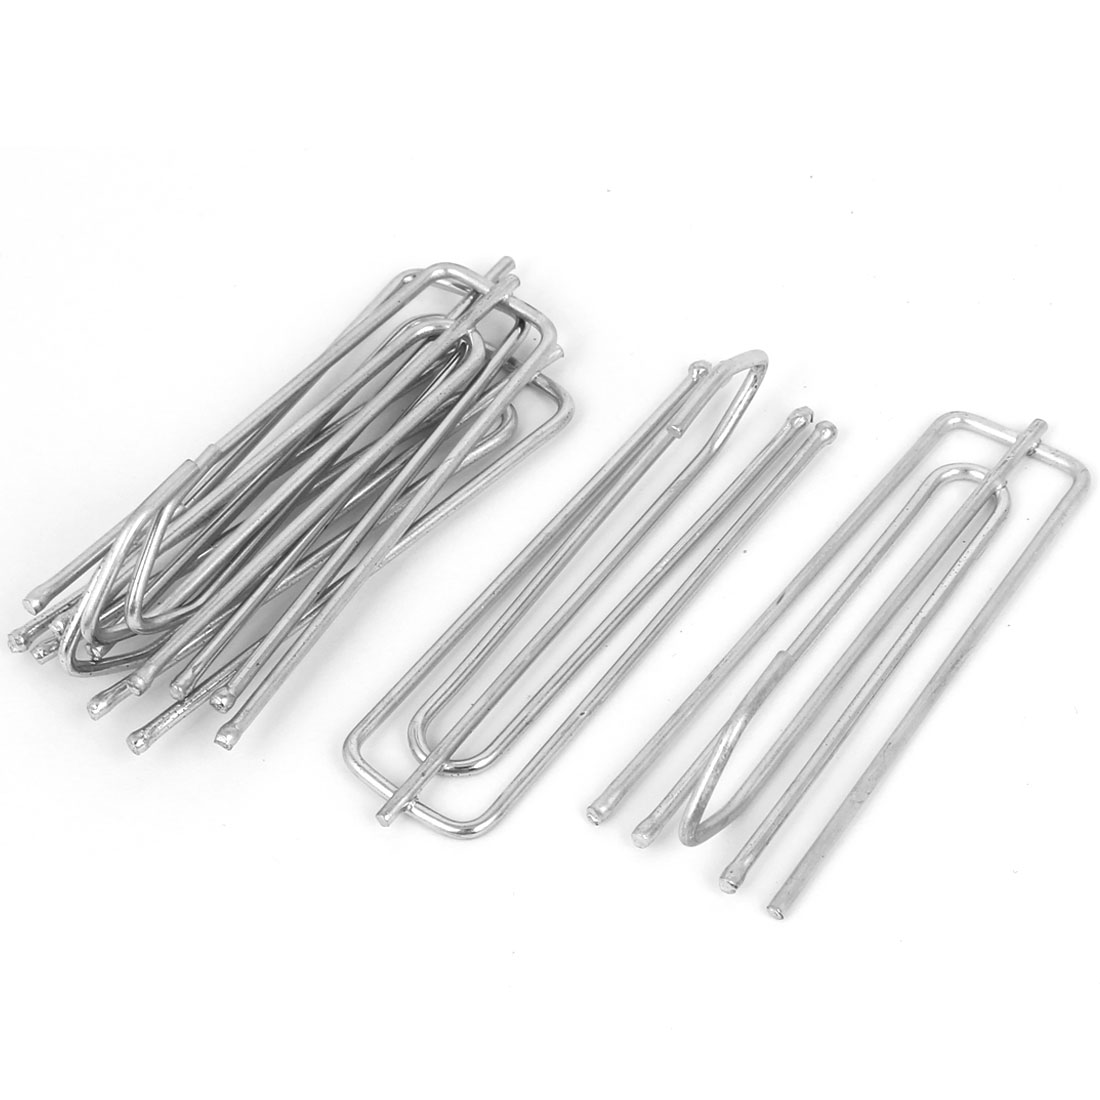 70mm Long 4-Prong Metal Pinch Pleat Curtain Hooks Silver